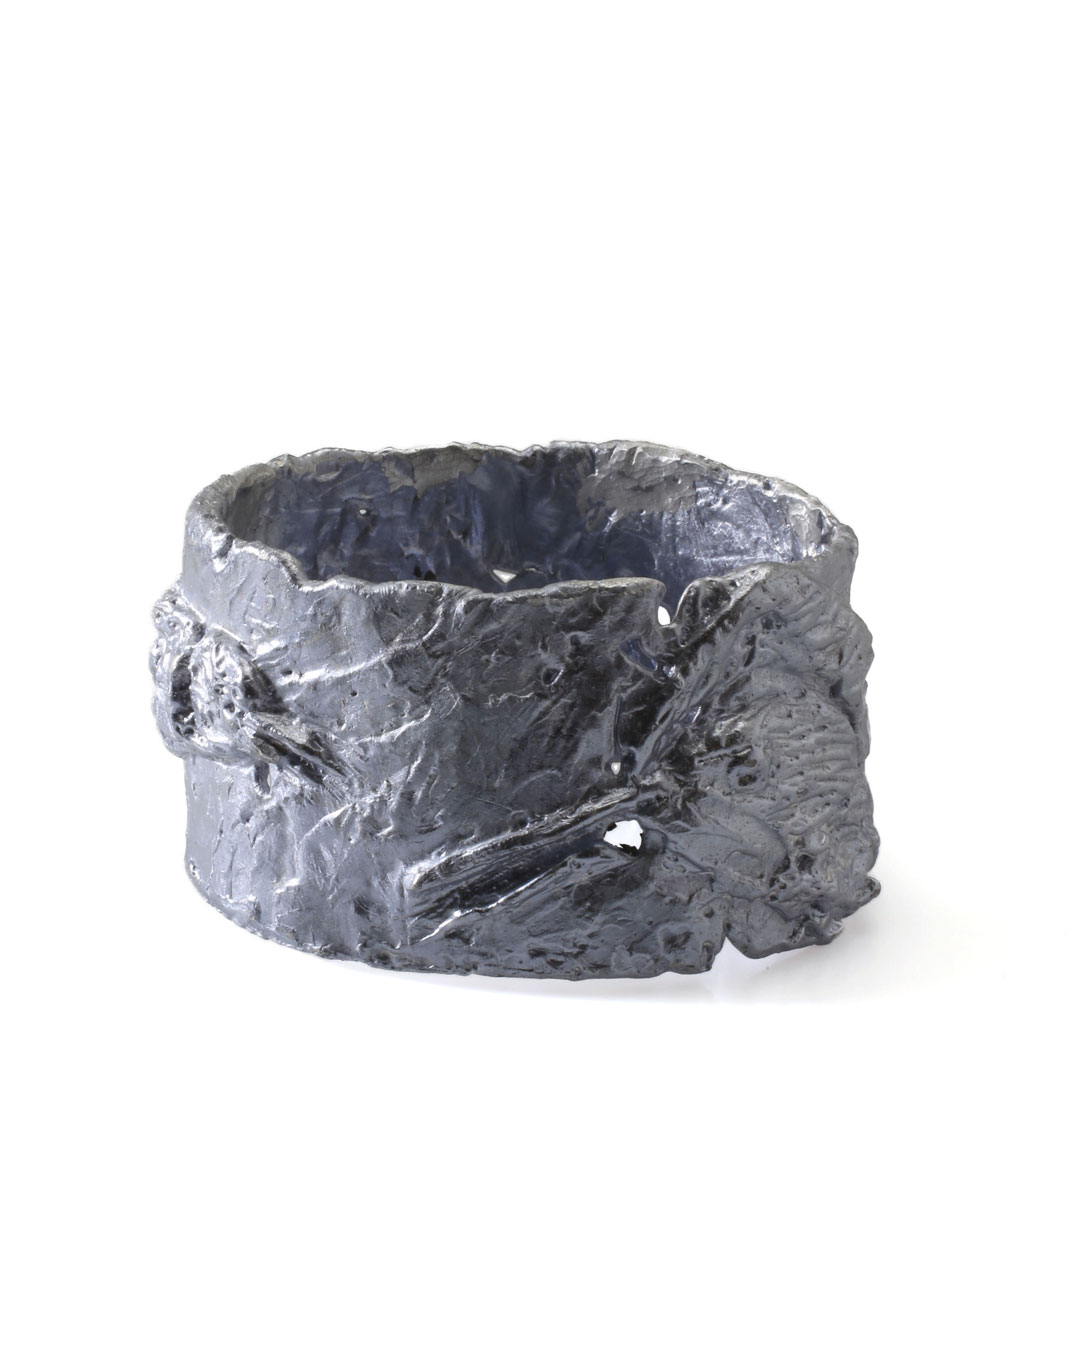 Juliane Brandes, zonder titel, 2013, armband; aluminium-mangaan, 80 x 45 mm, €1100